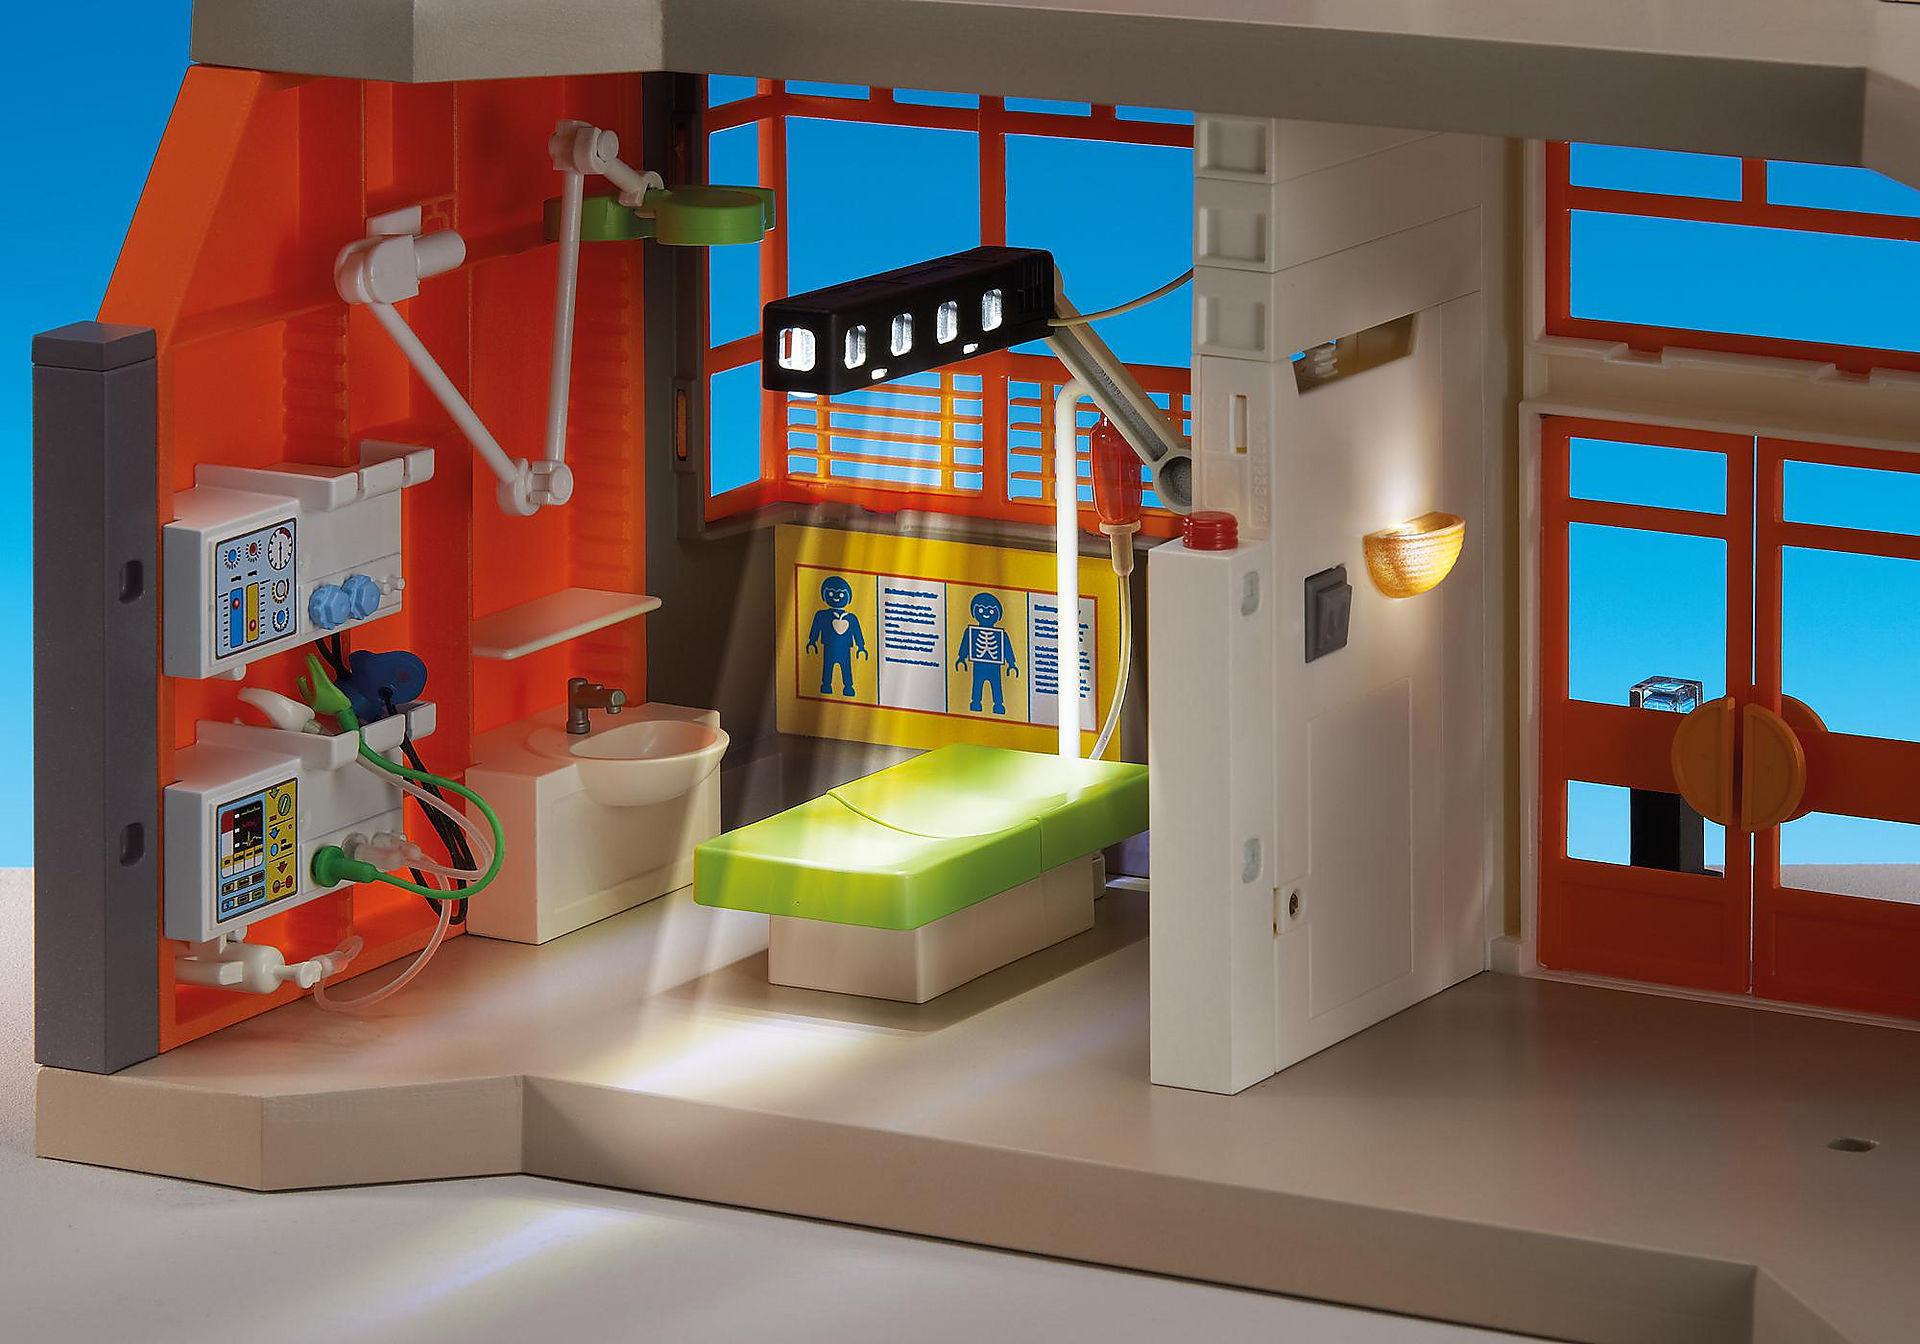 http://media.playmobil.com/i/playmobil/6446_product_extra1/Belysningssæt til børnehospital